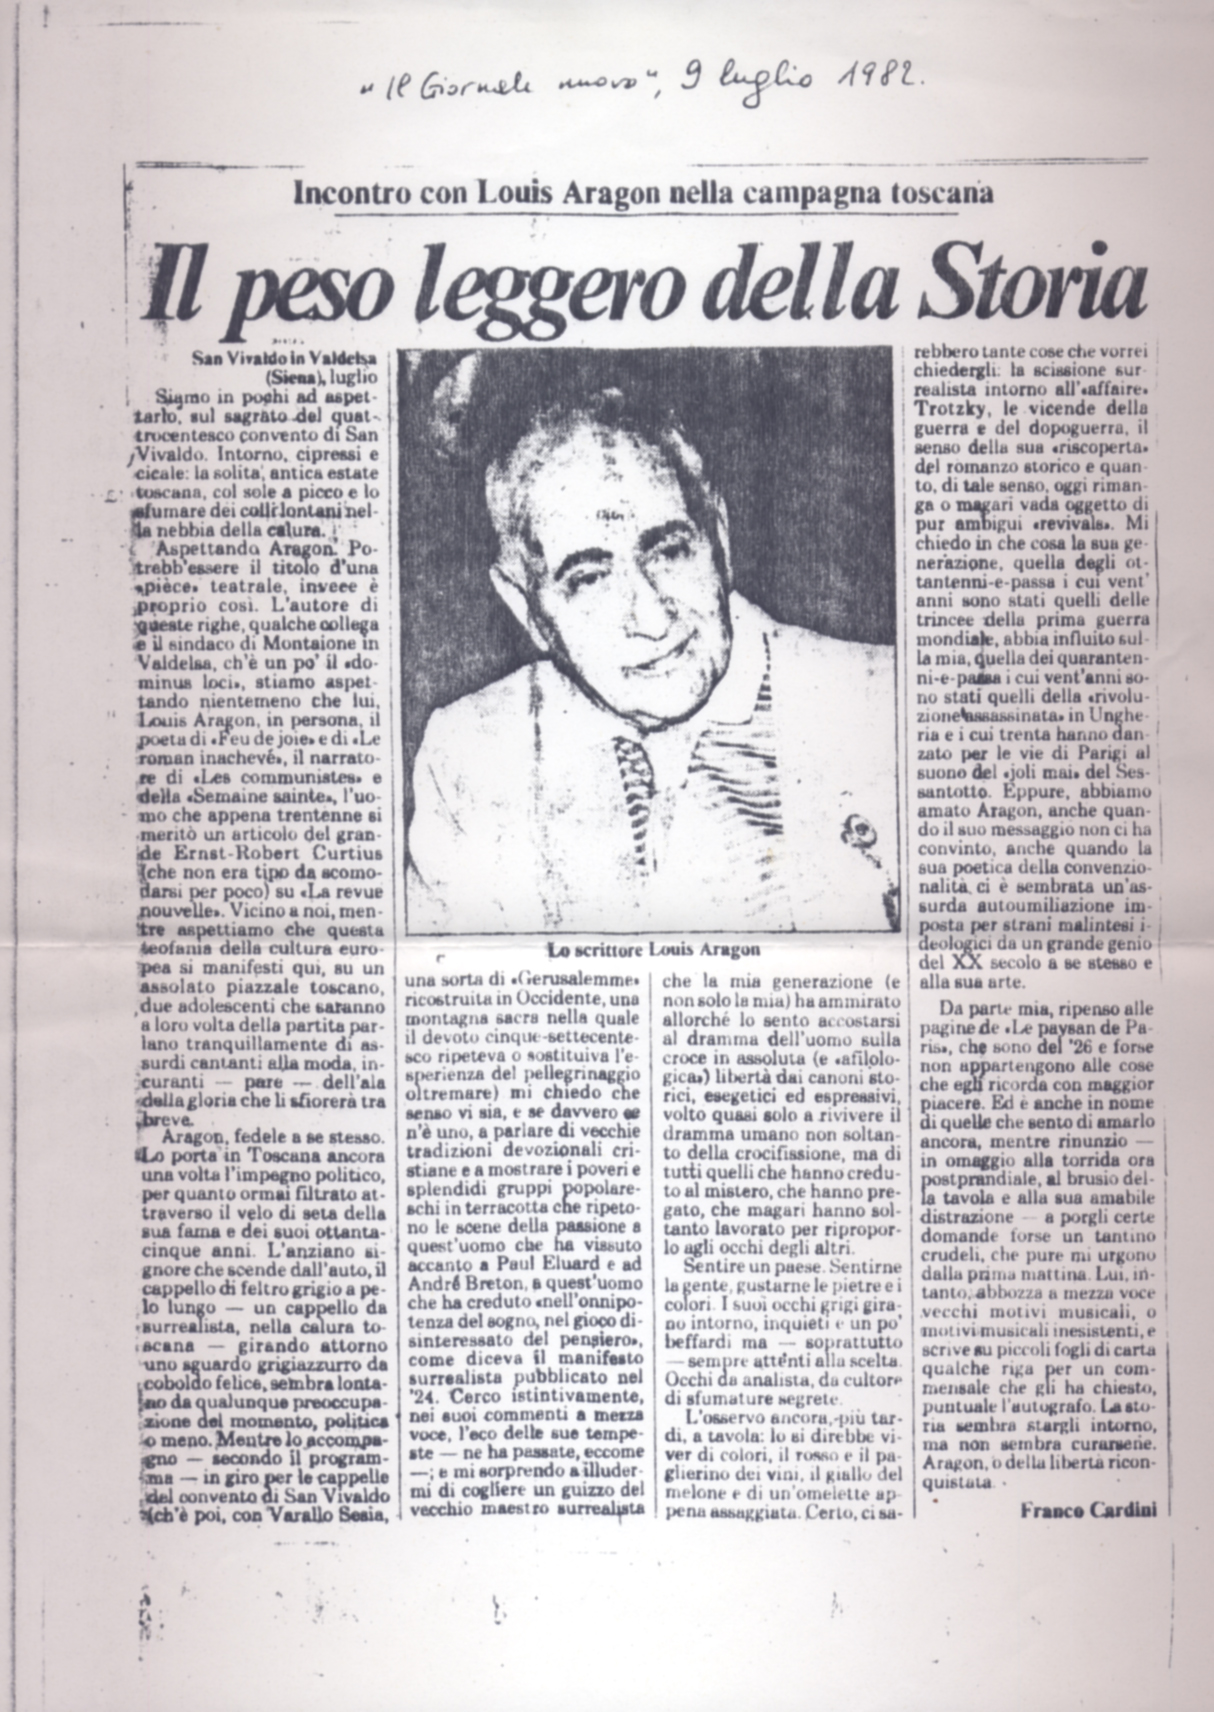 Franco Cardini su Aragon